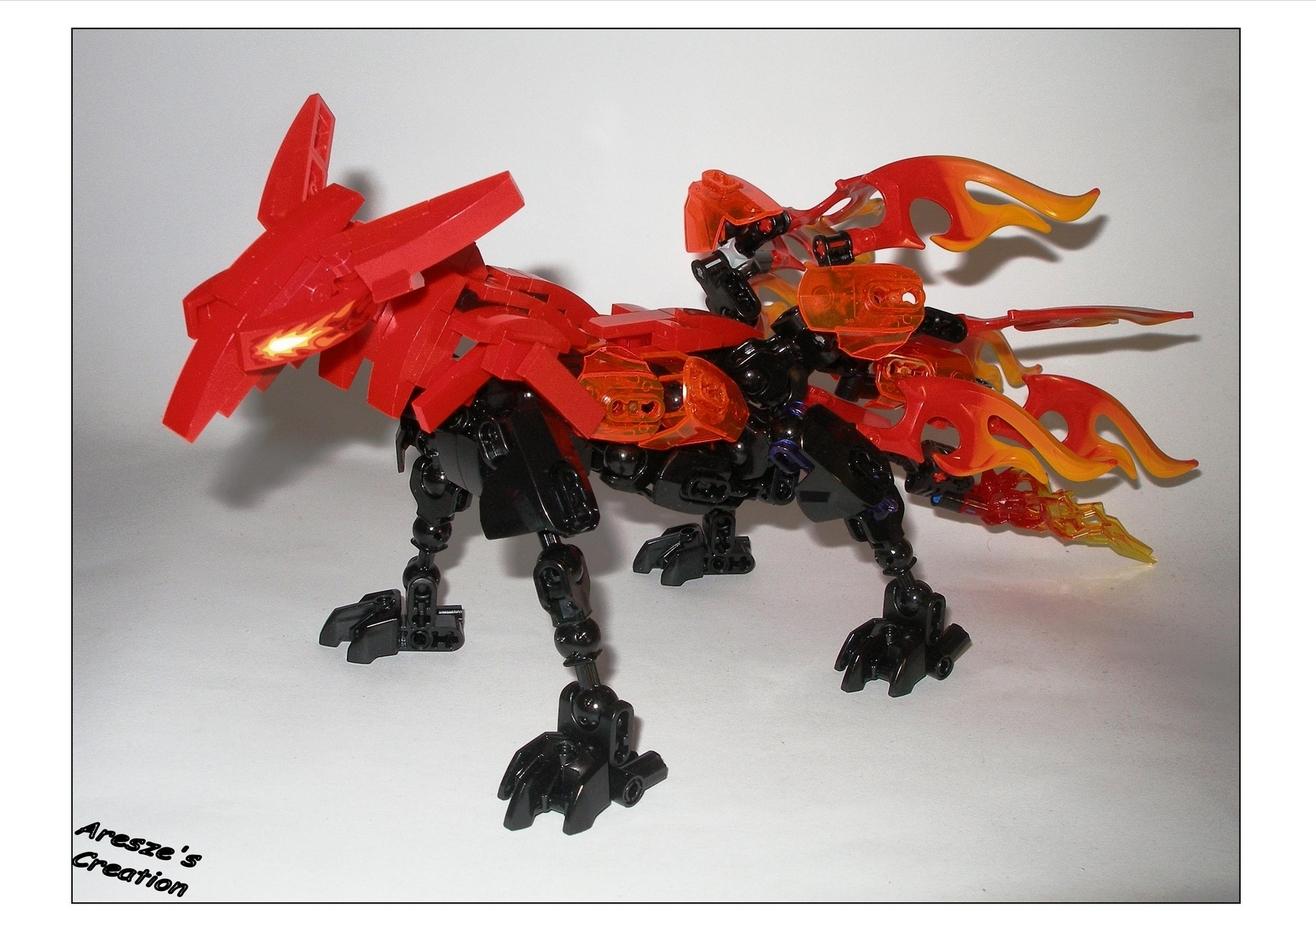 aresze moc - Nine-tailed Fox 001